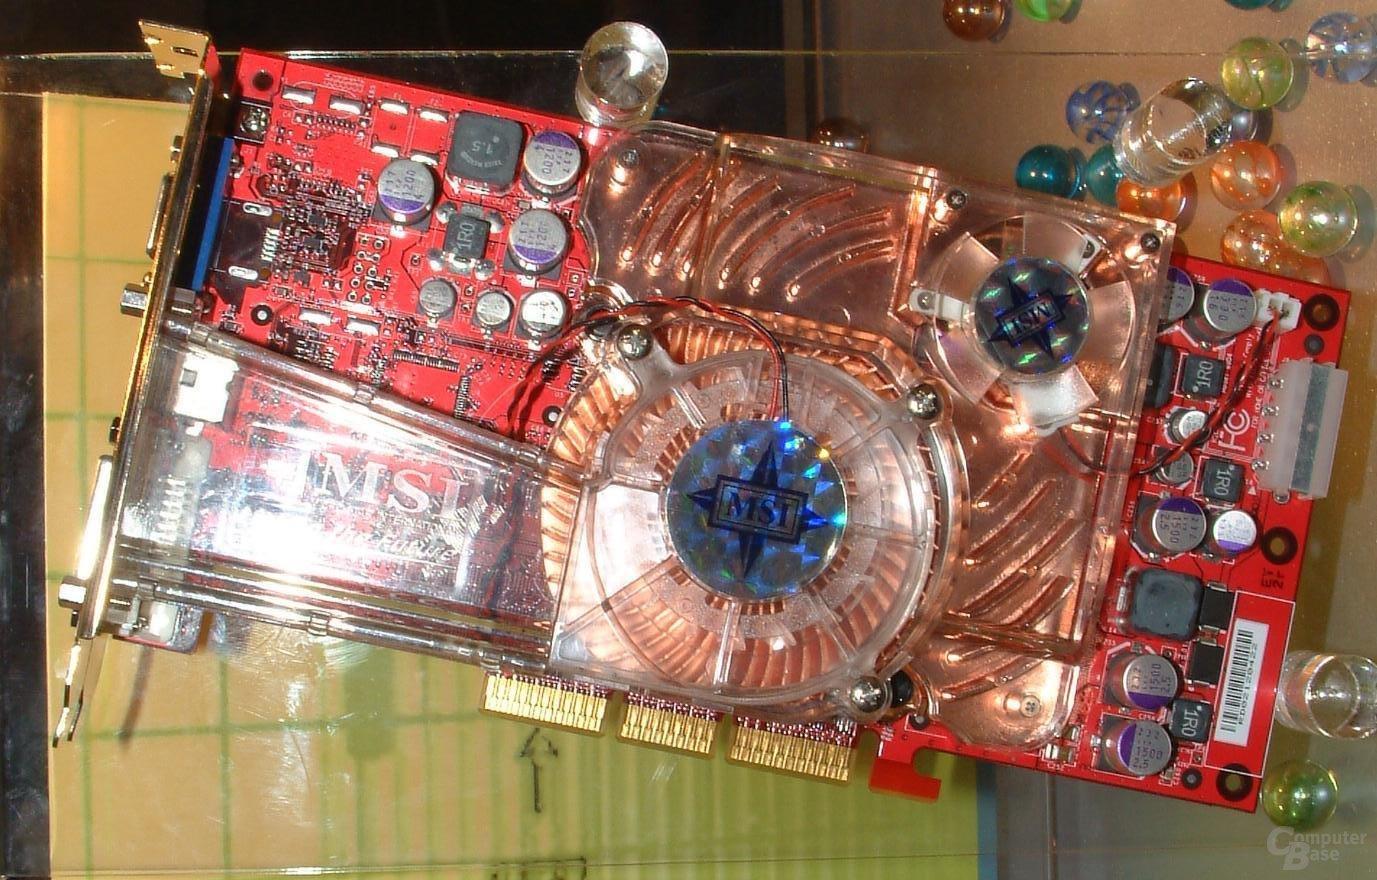 MSI FX5800